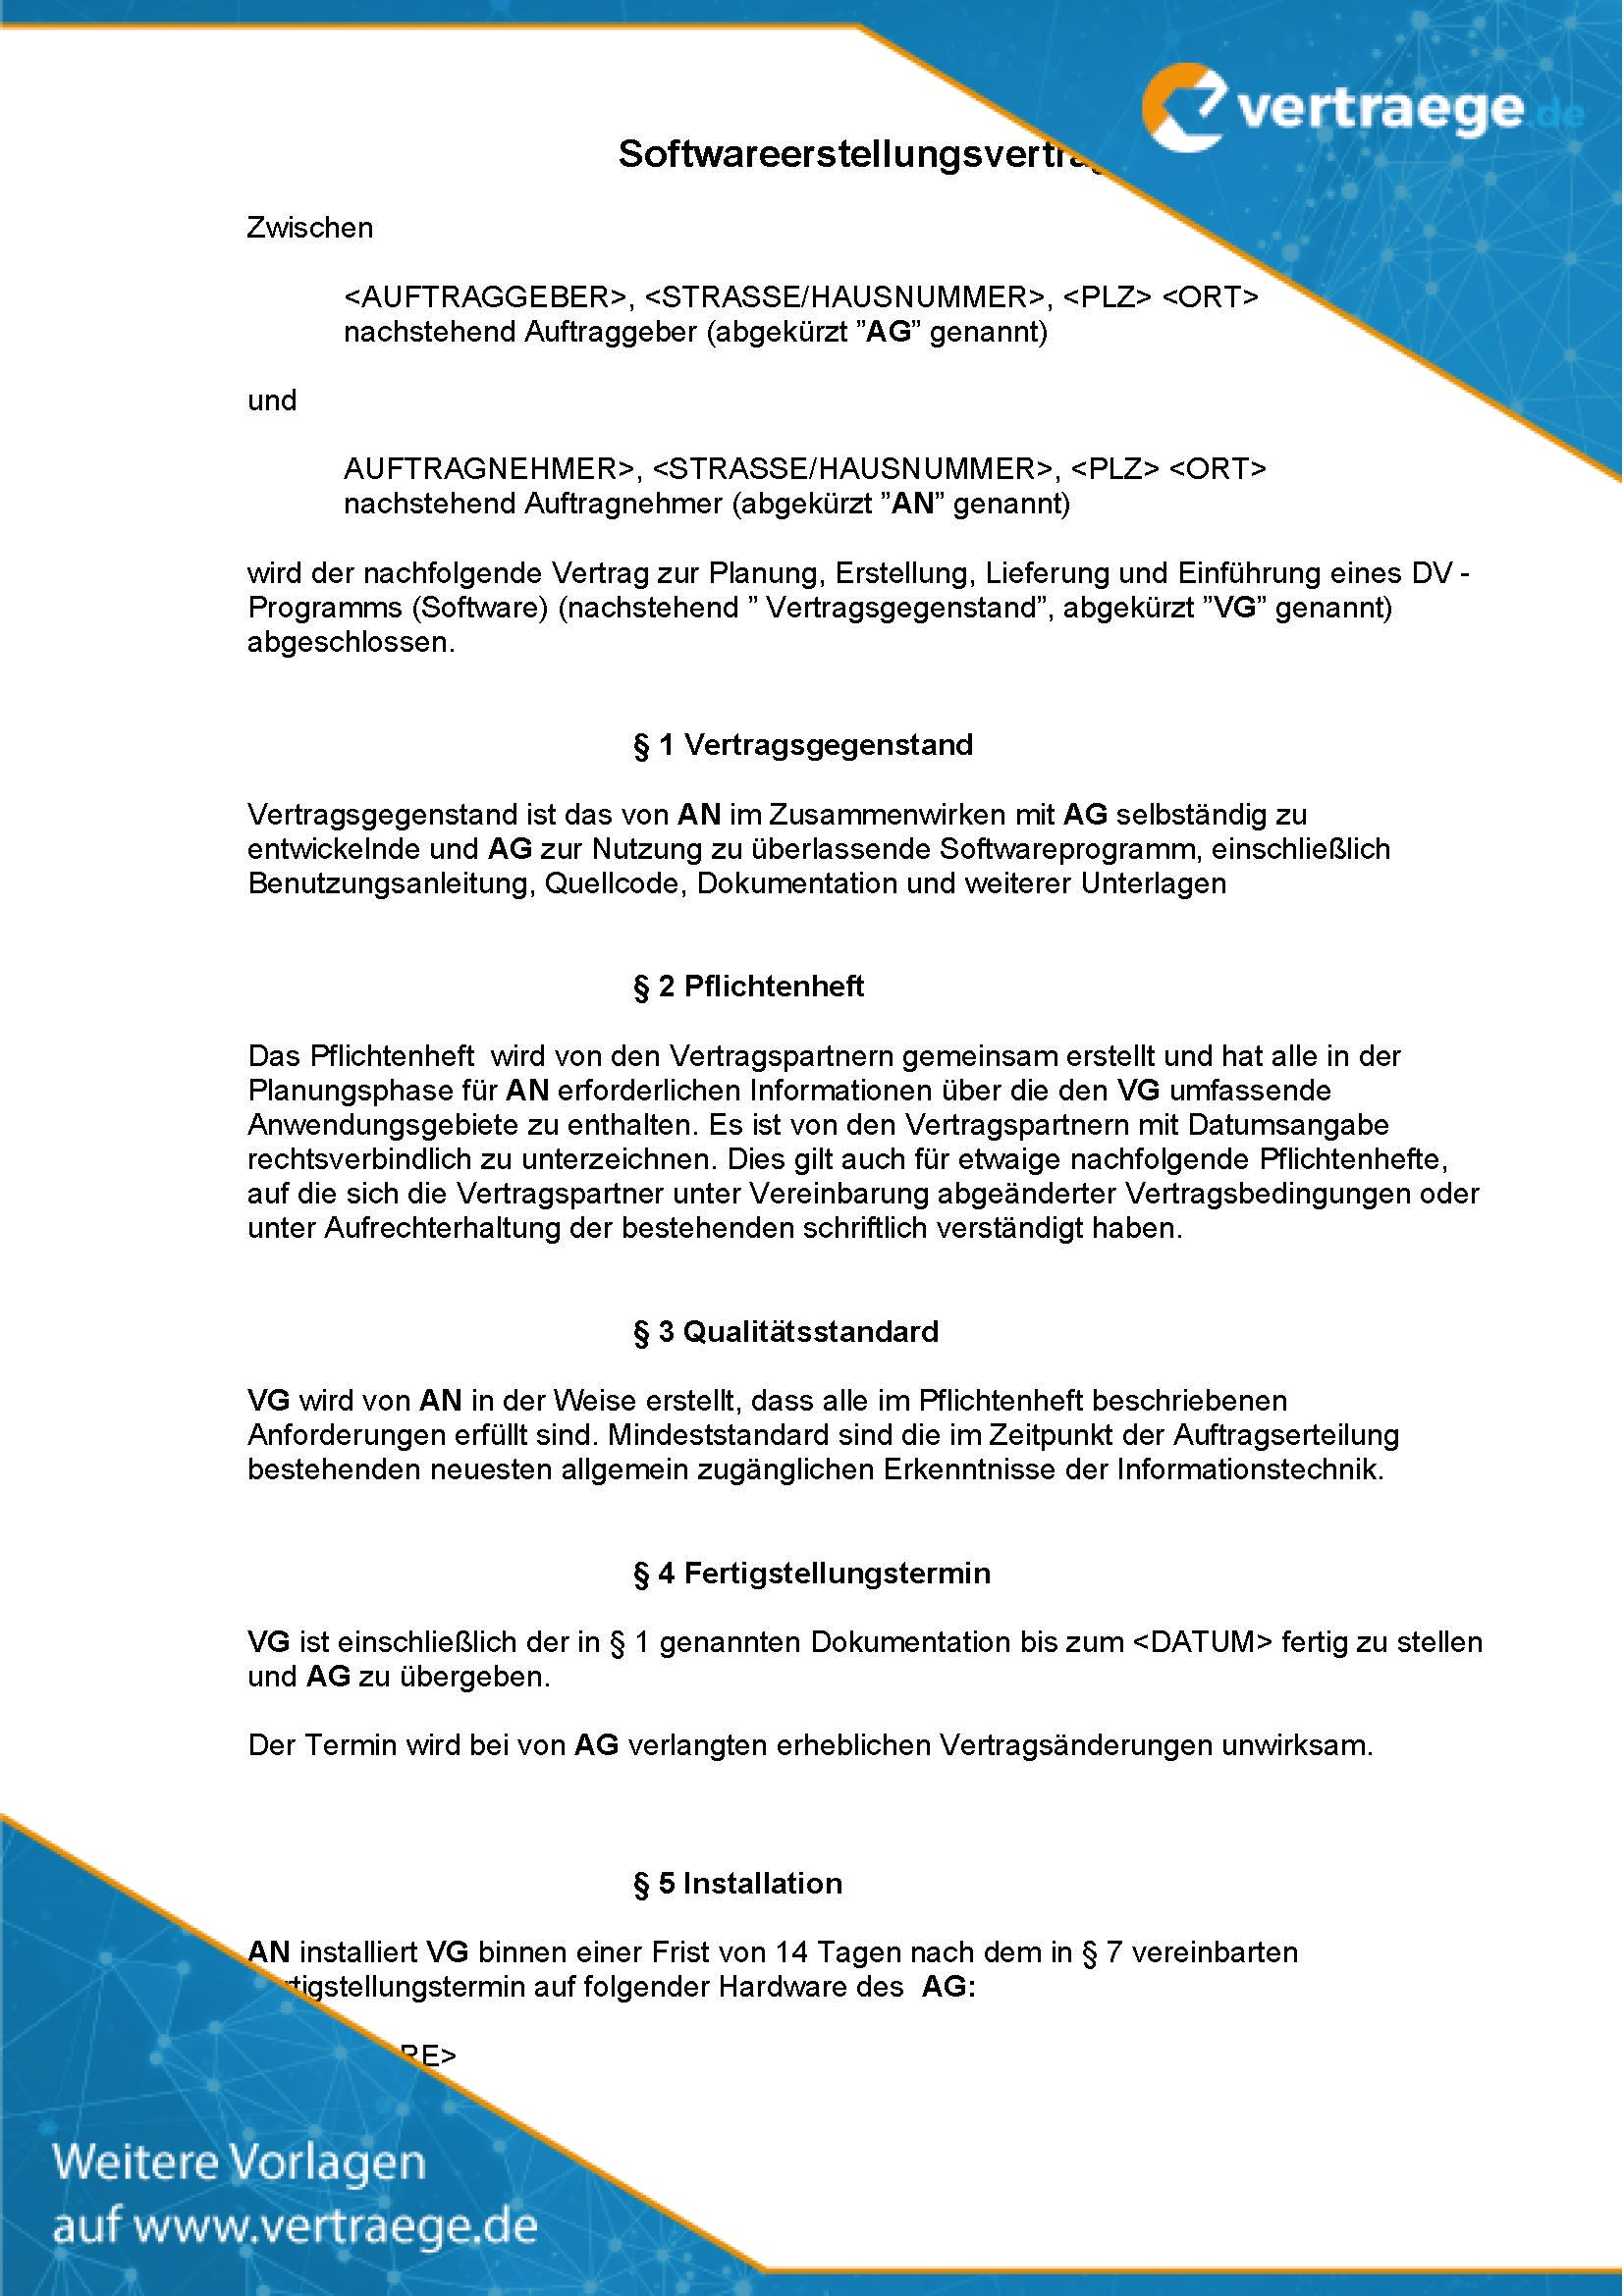 Muster Vertrag Softwareerstellungsvertrag